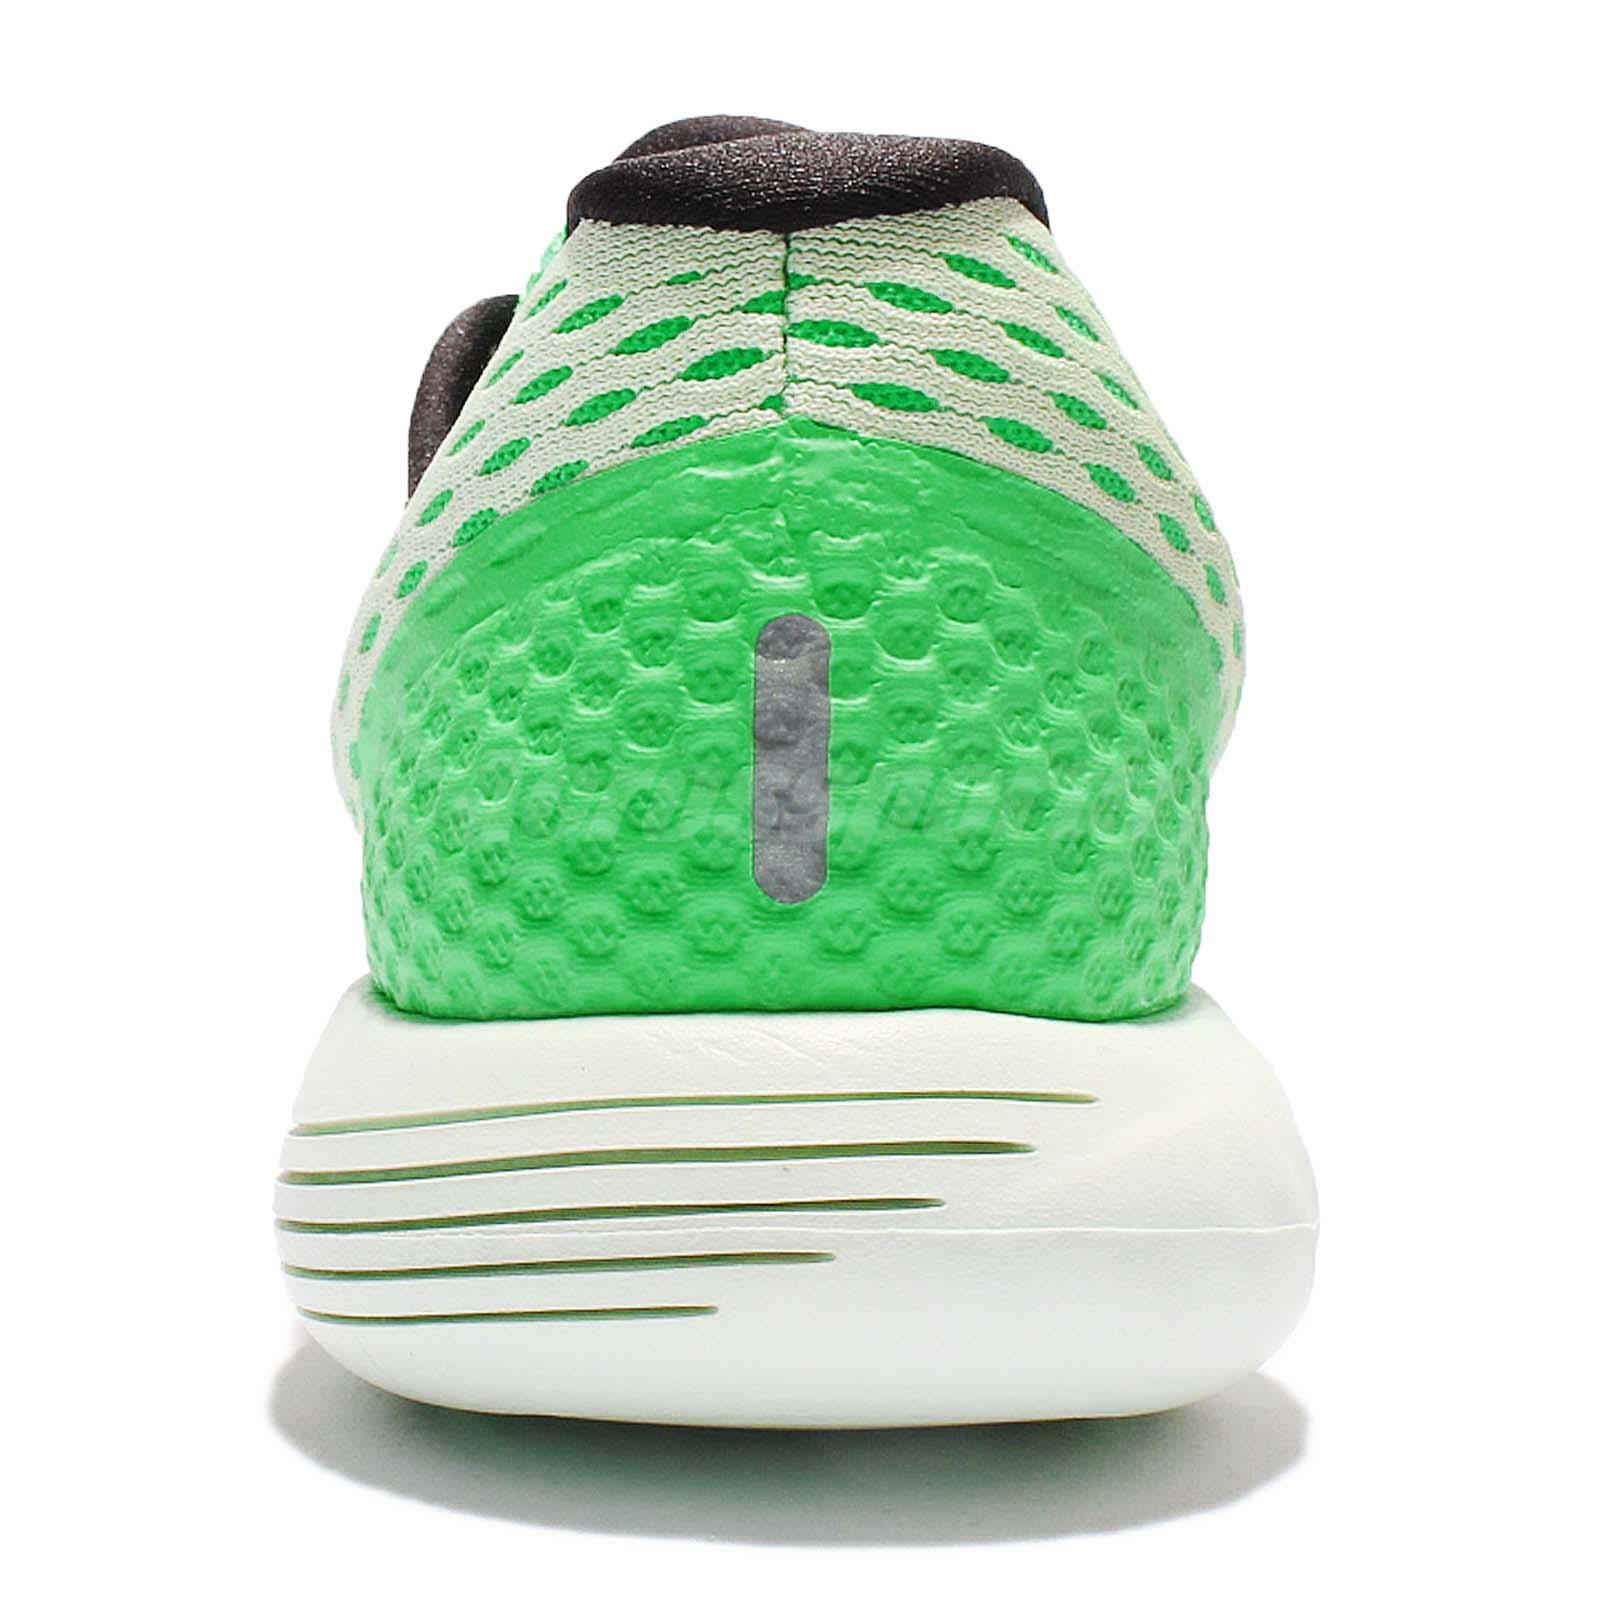 Wmns Nike Lunarglide 8 VIII Green Black Women Running Shoes Sneakers ... 78bd4781f